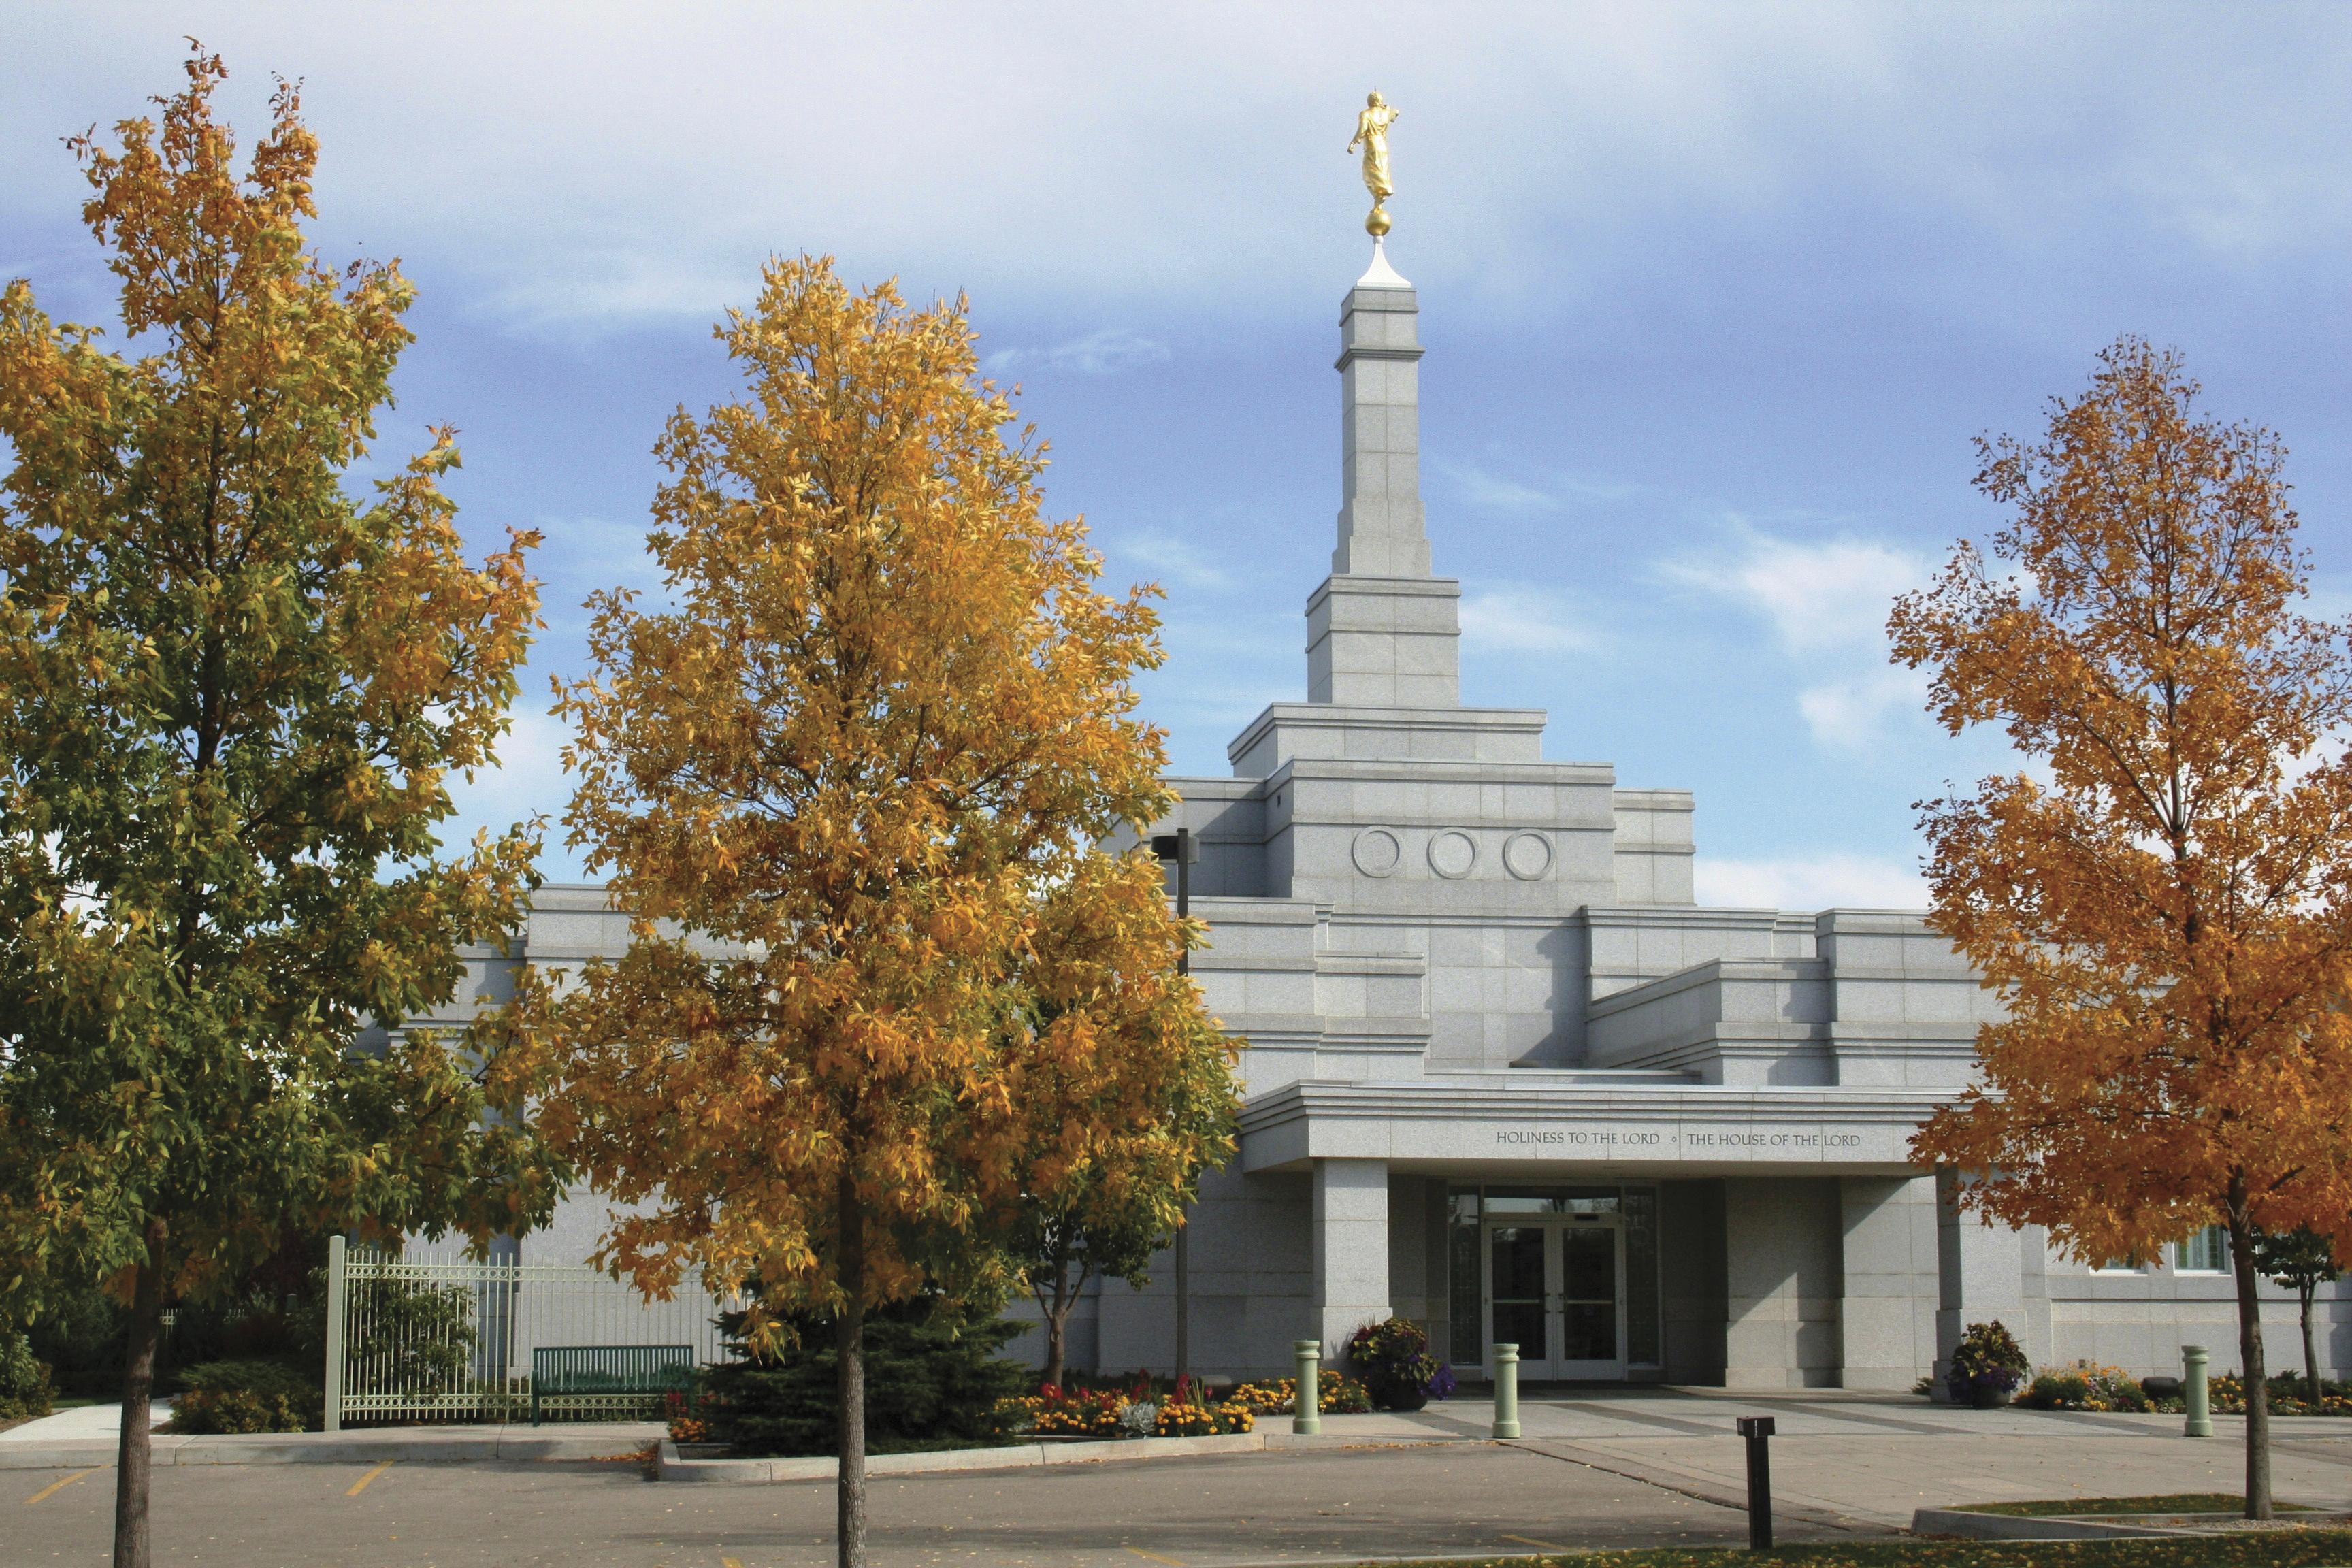 The Regina Saskatchewan Temple entrance and scenery.